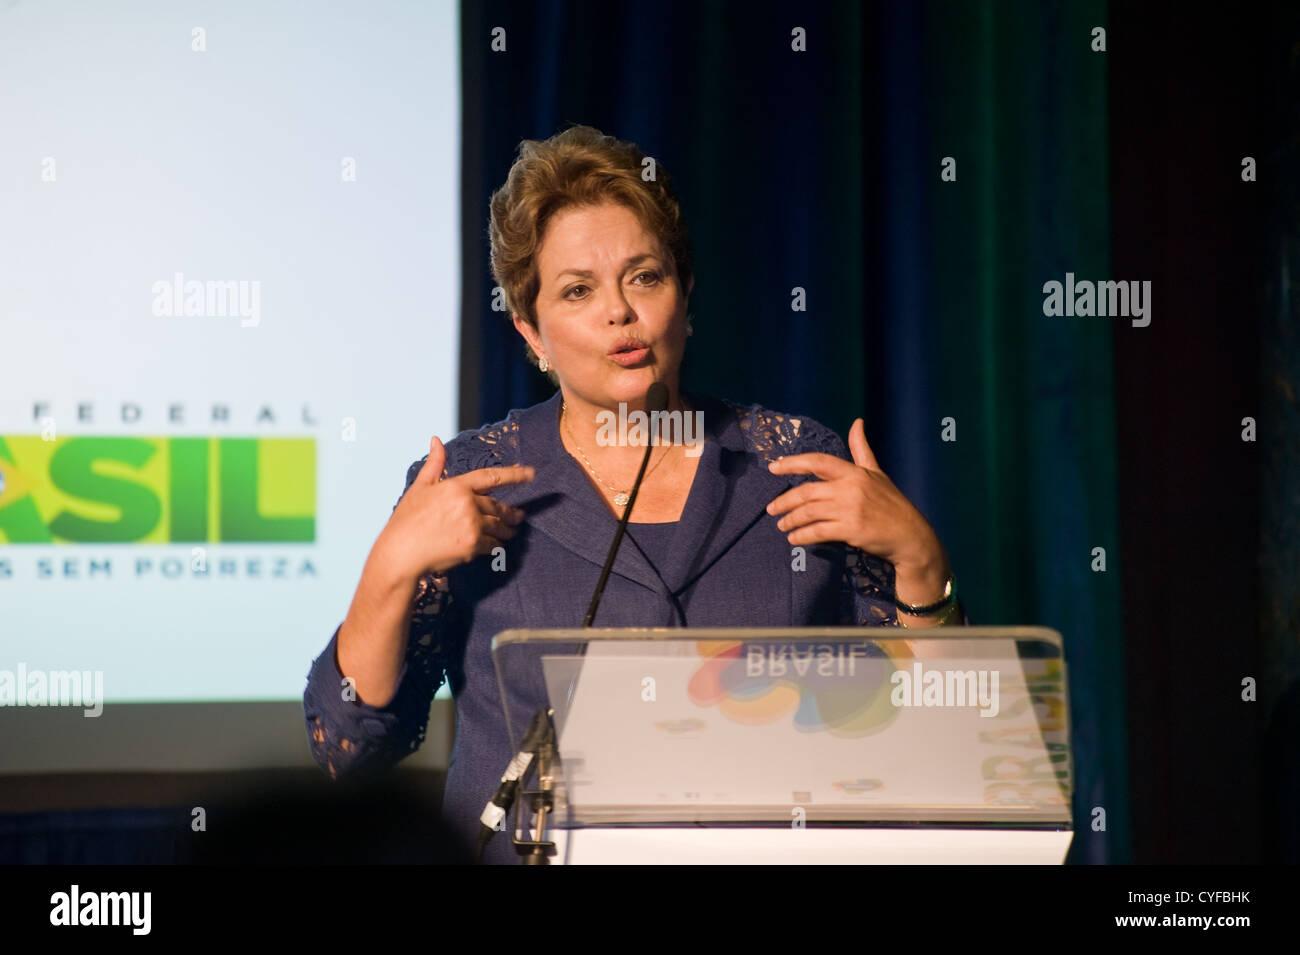 Dilma Rousseff, President of Brazil - Stock Image